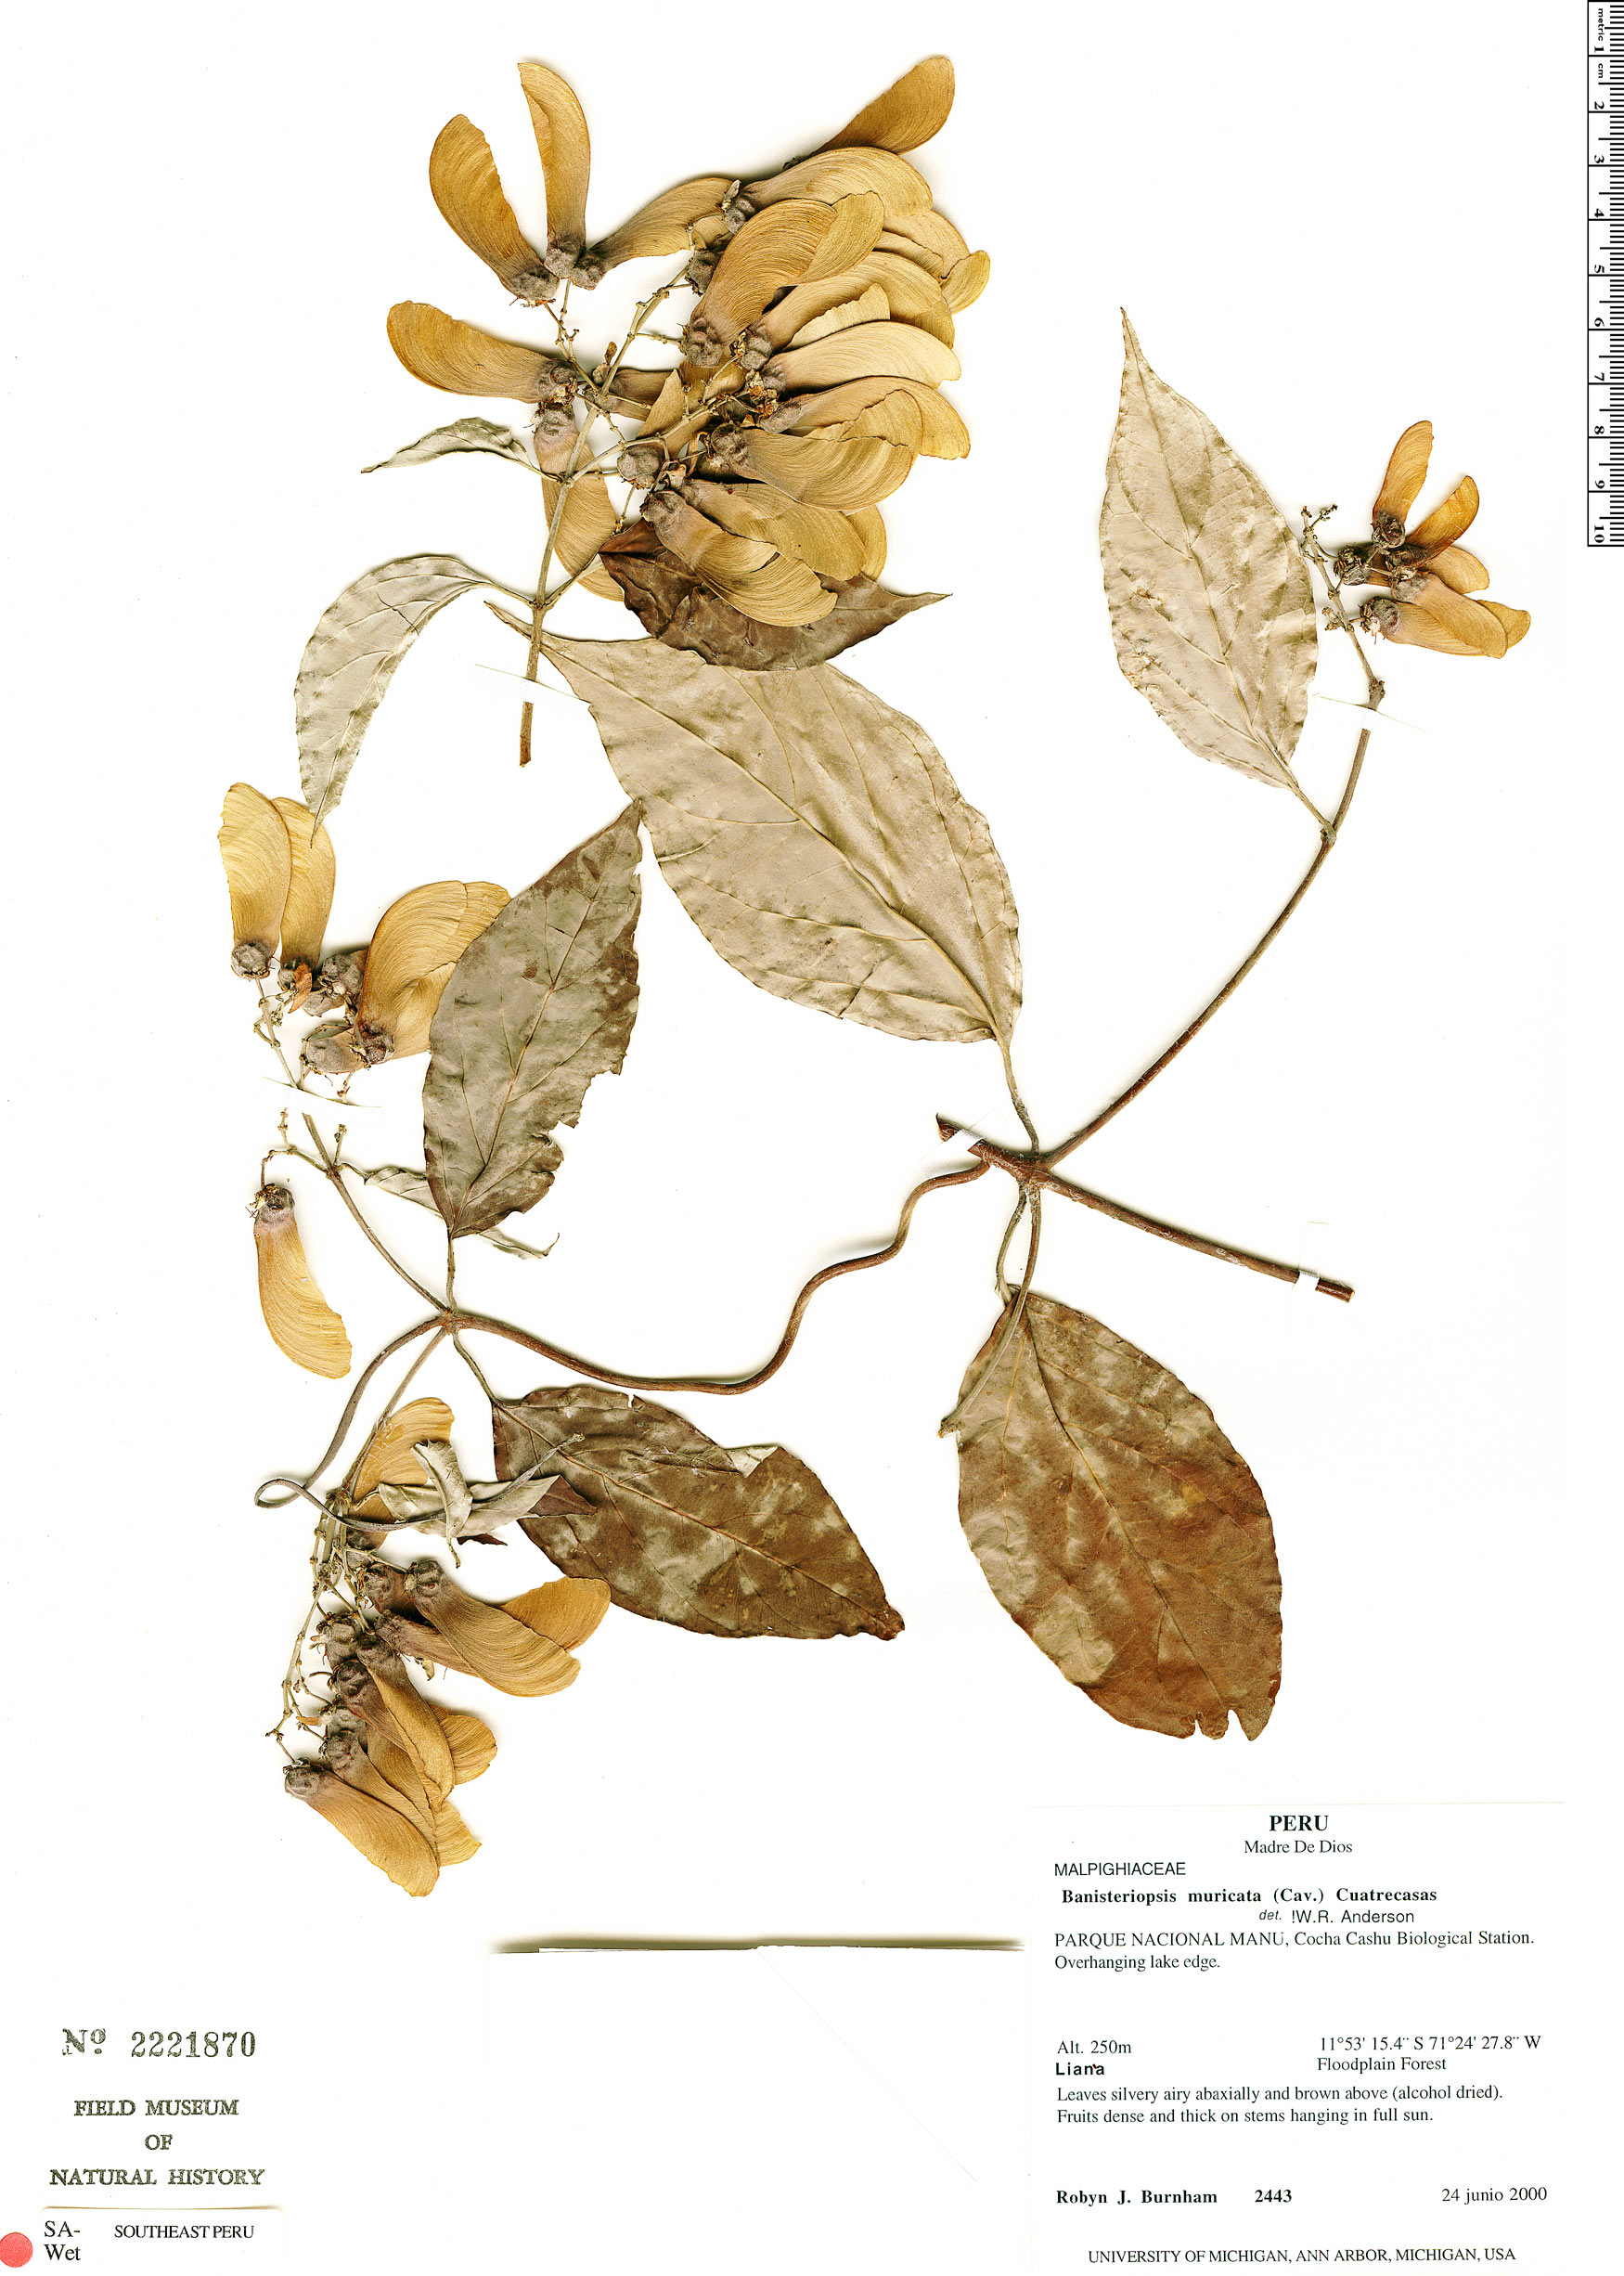 Specimen: Banisteriopsis muricata